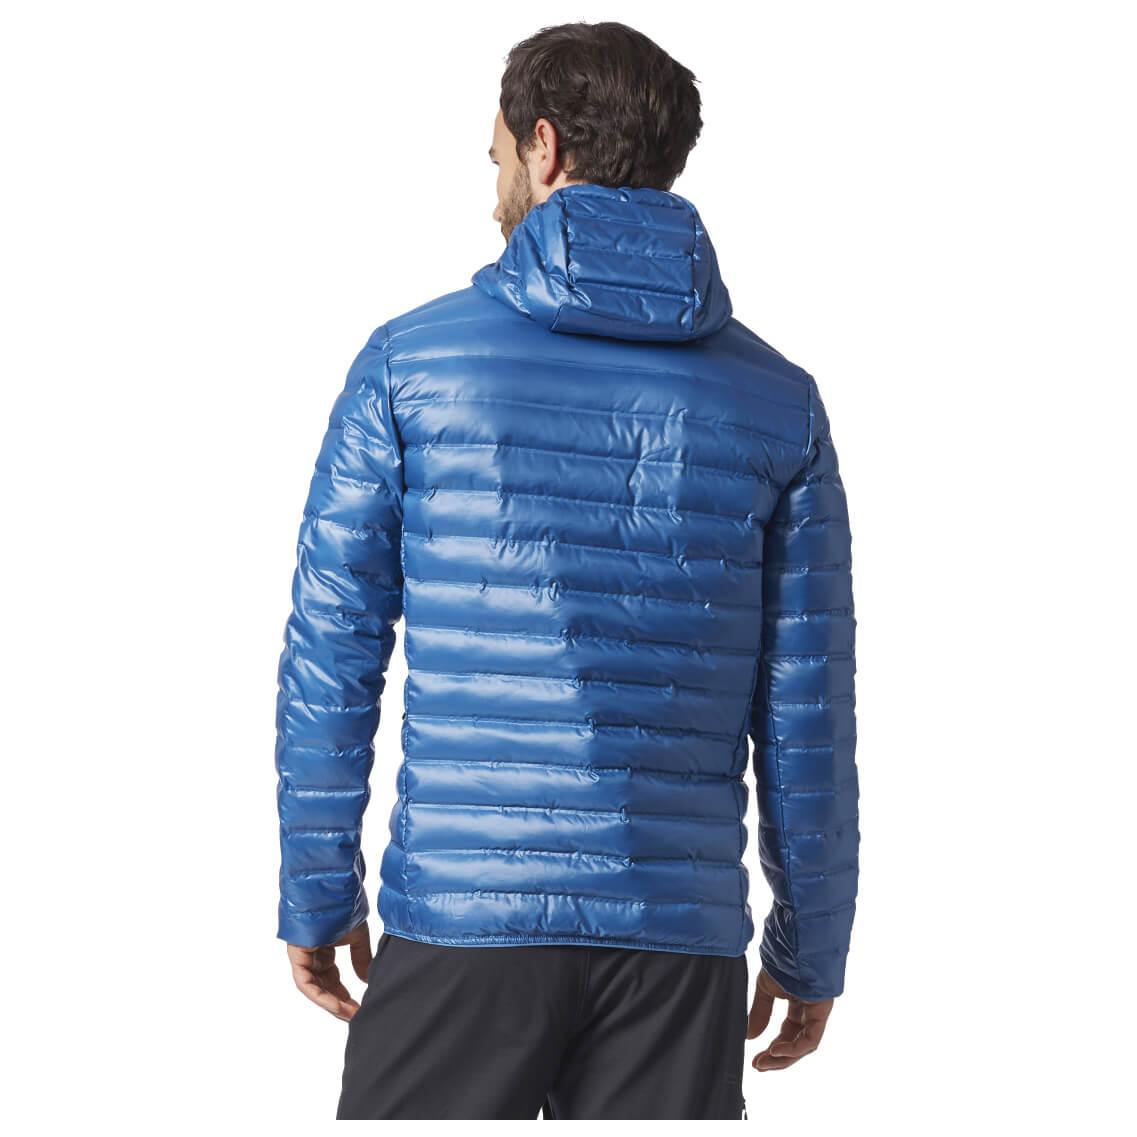 adidas terrex jacket